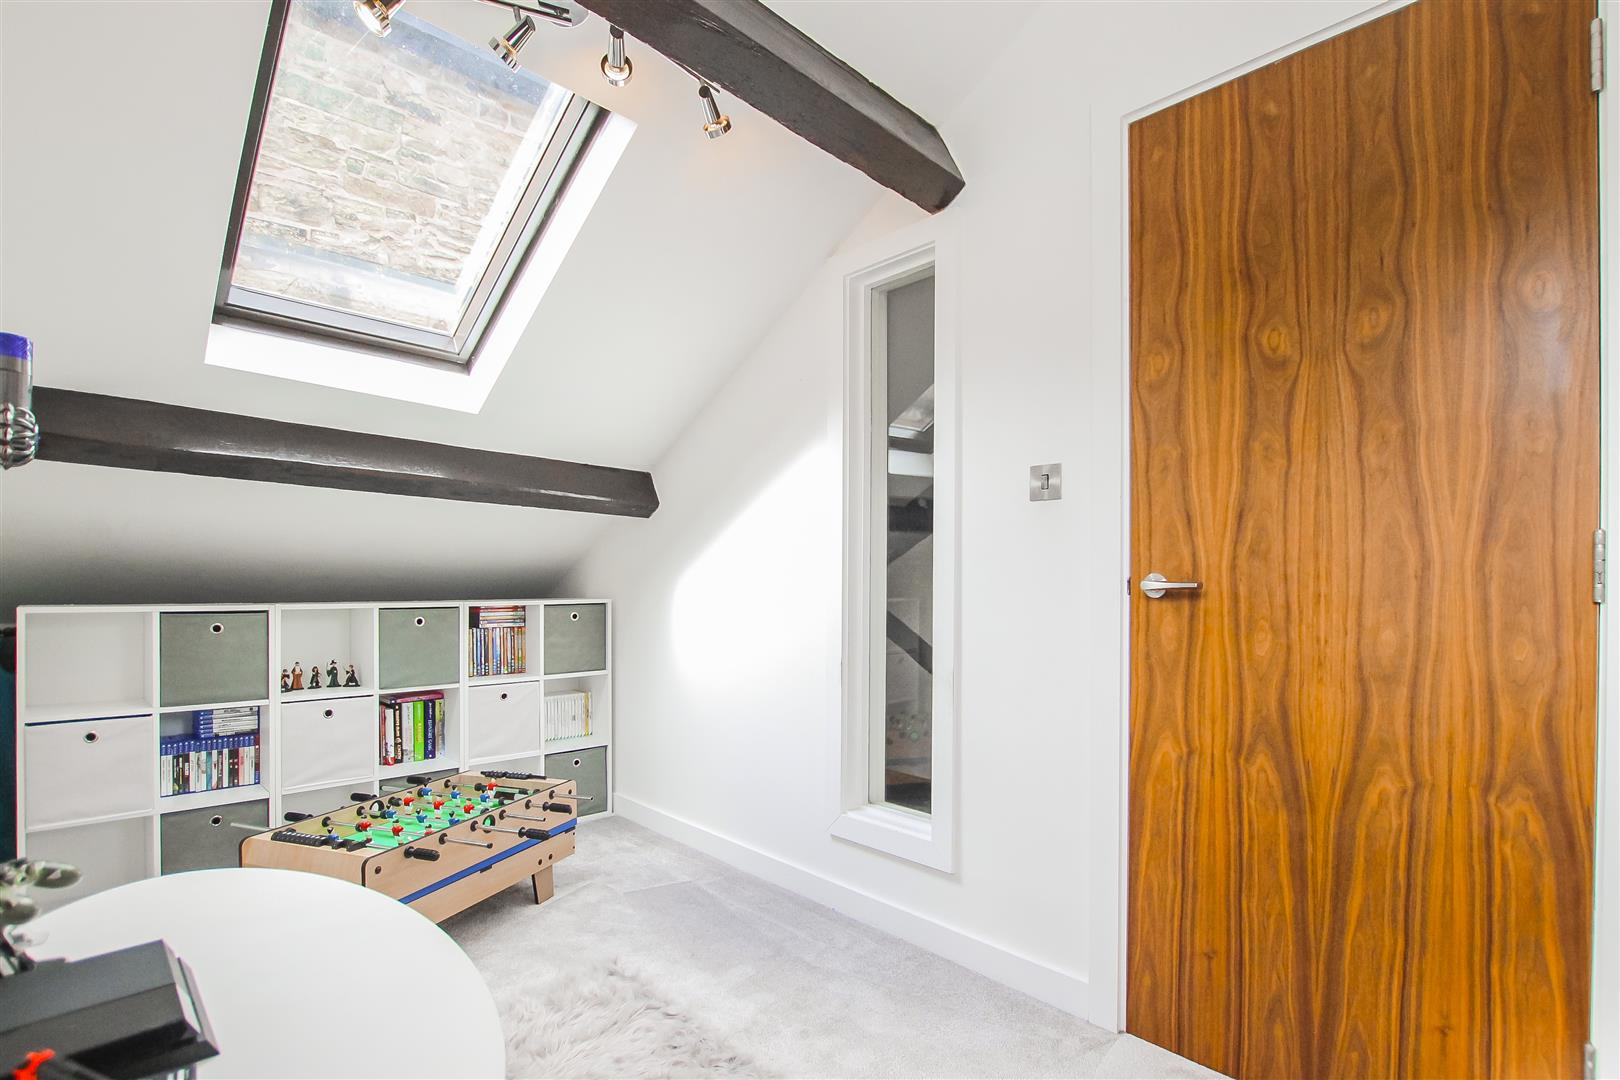 3 Bedroom Duplex Apartment For Sale - Image 44